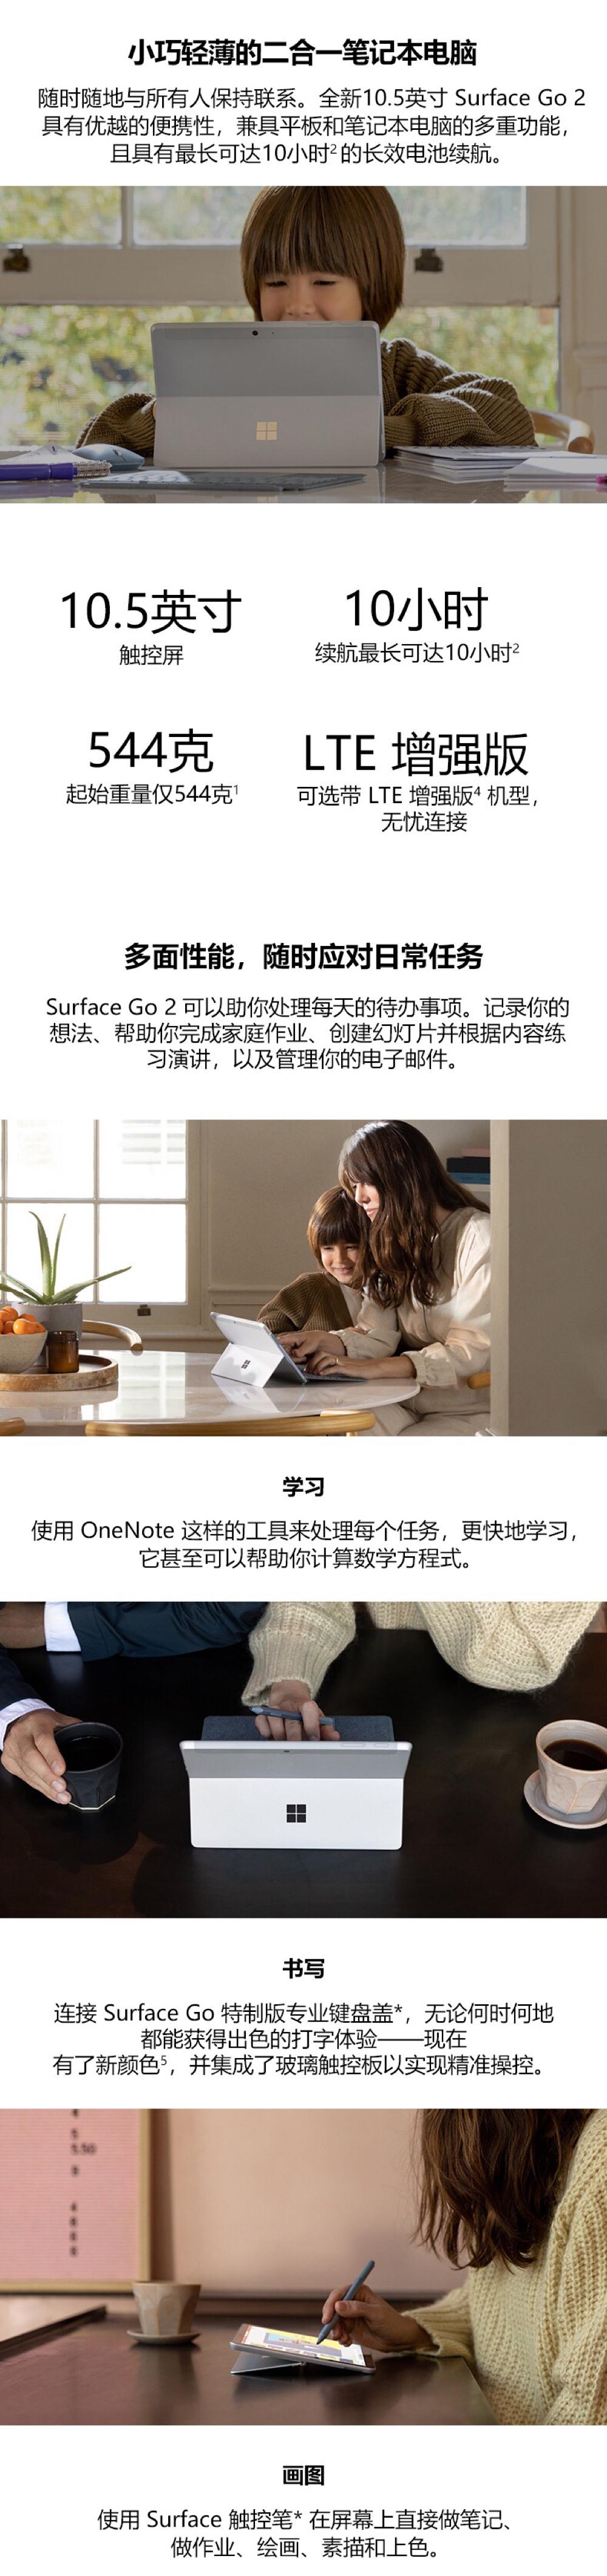 Surface Go 2+键鼠套装免费试用,评测